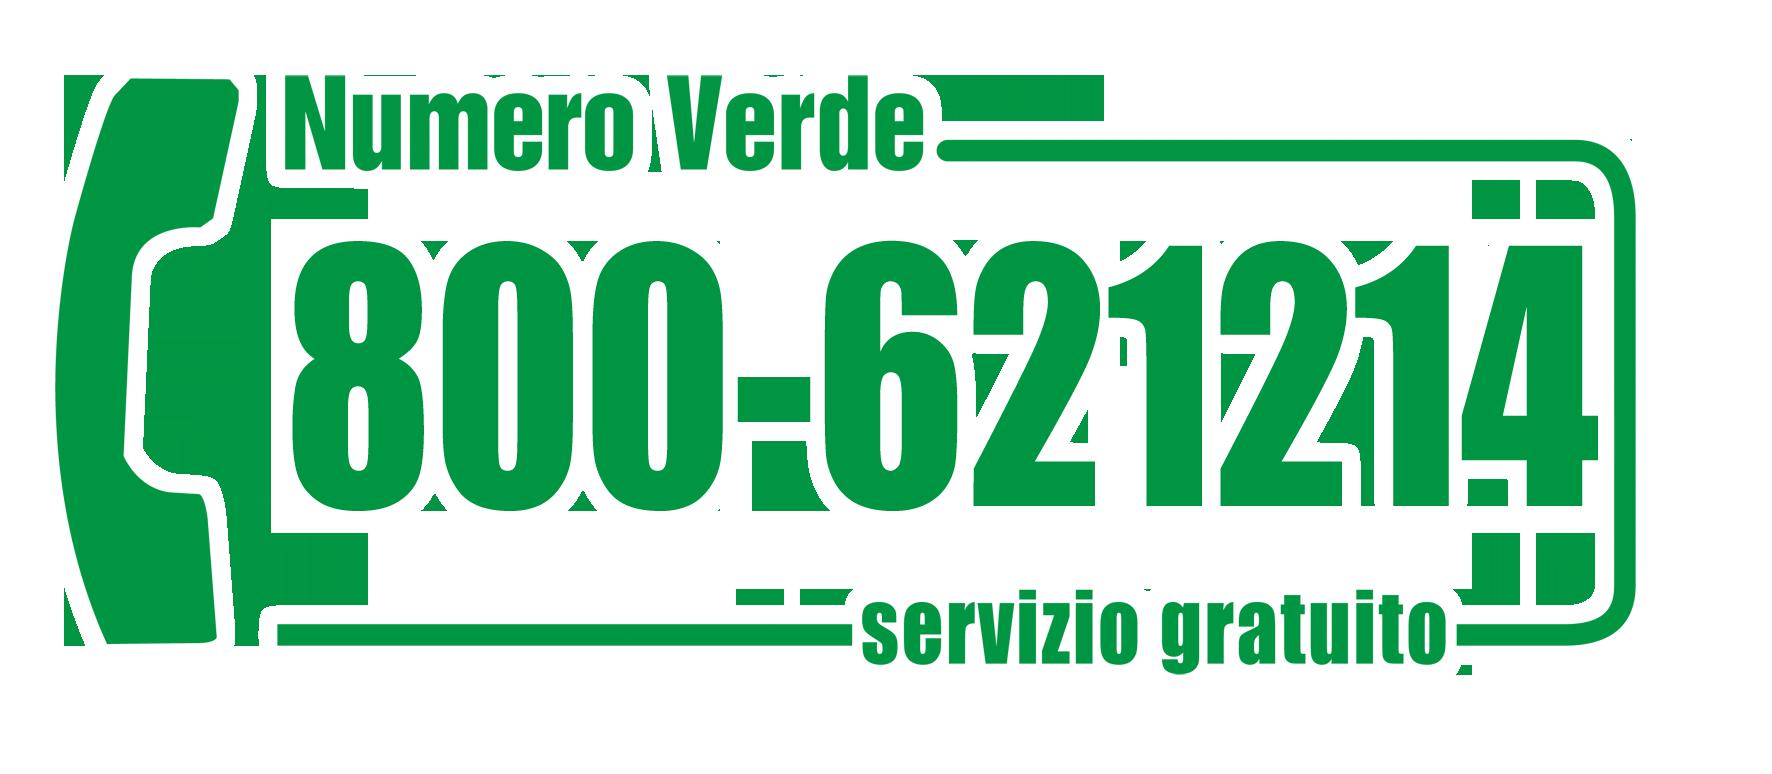 Numero verde tv2000 - Numero verde poltronesofa ...